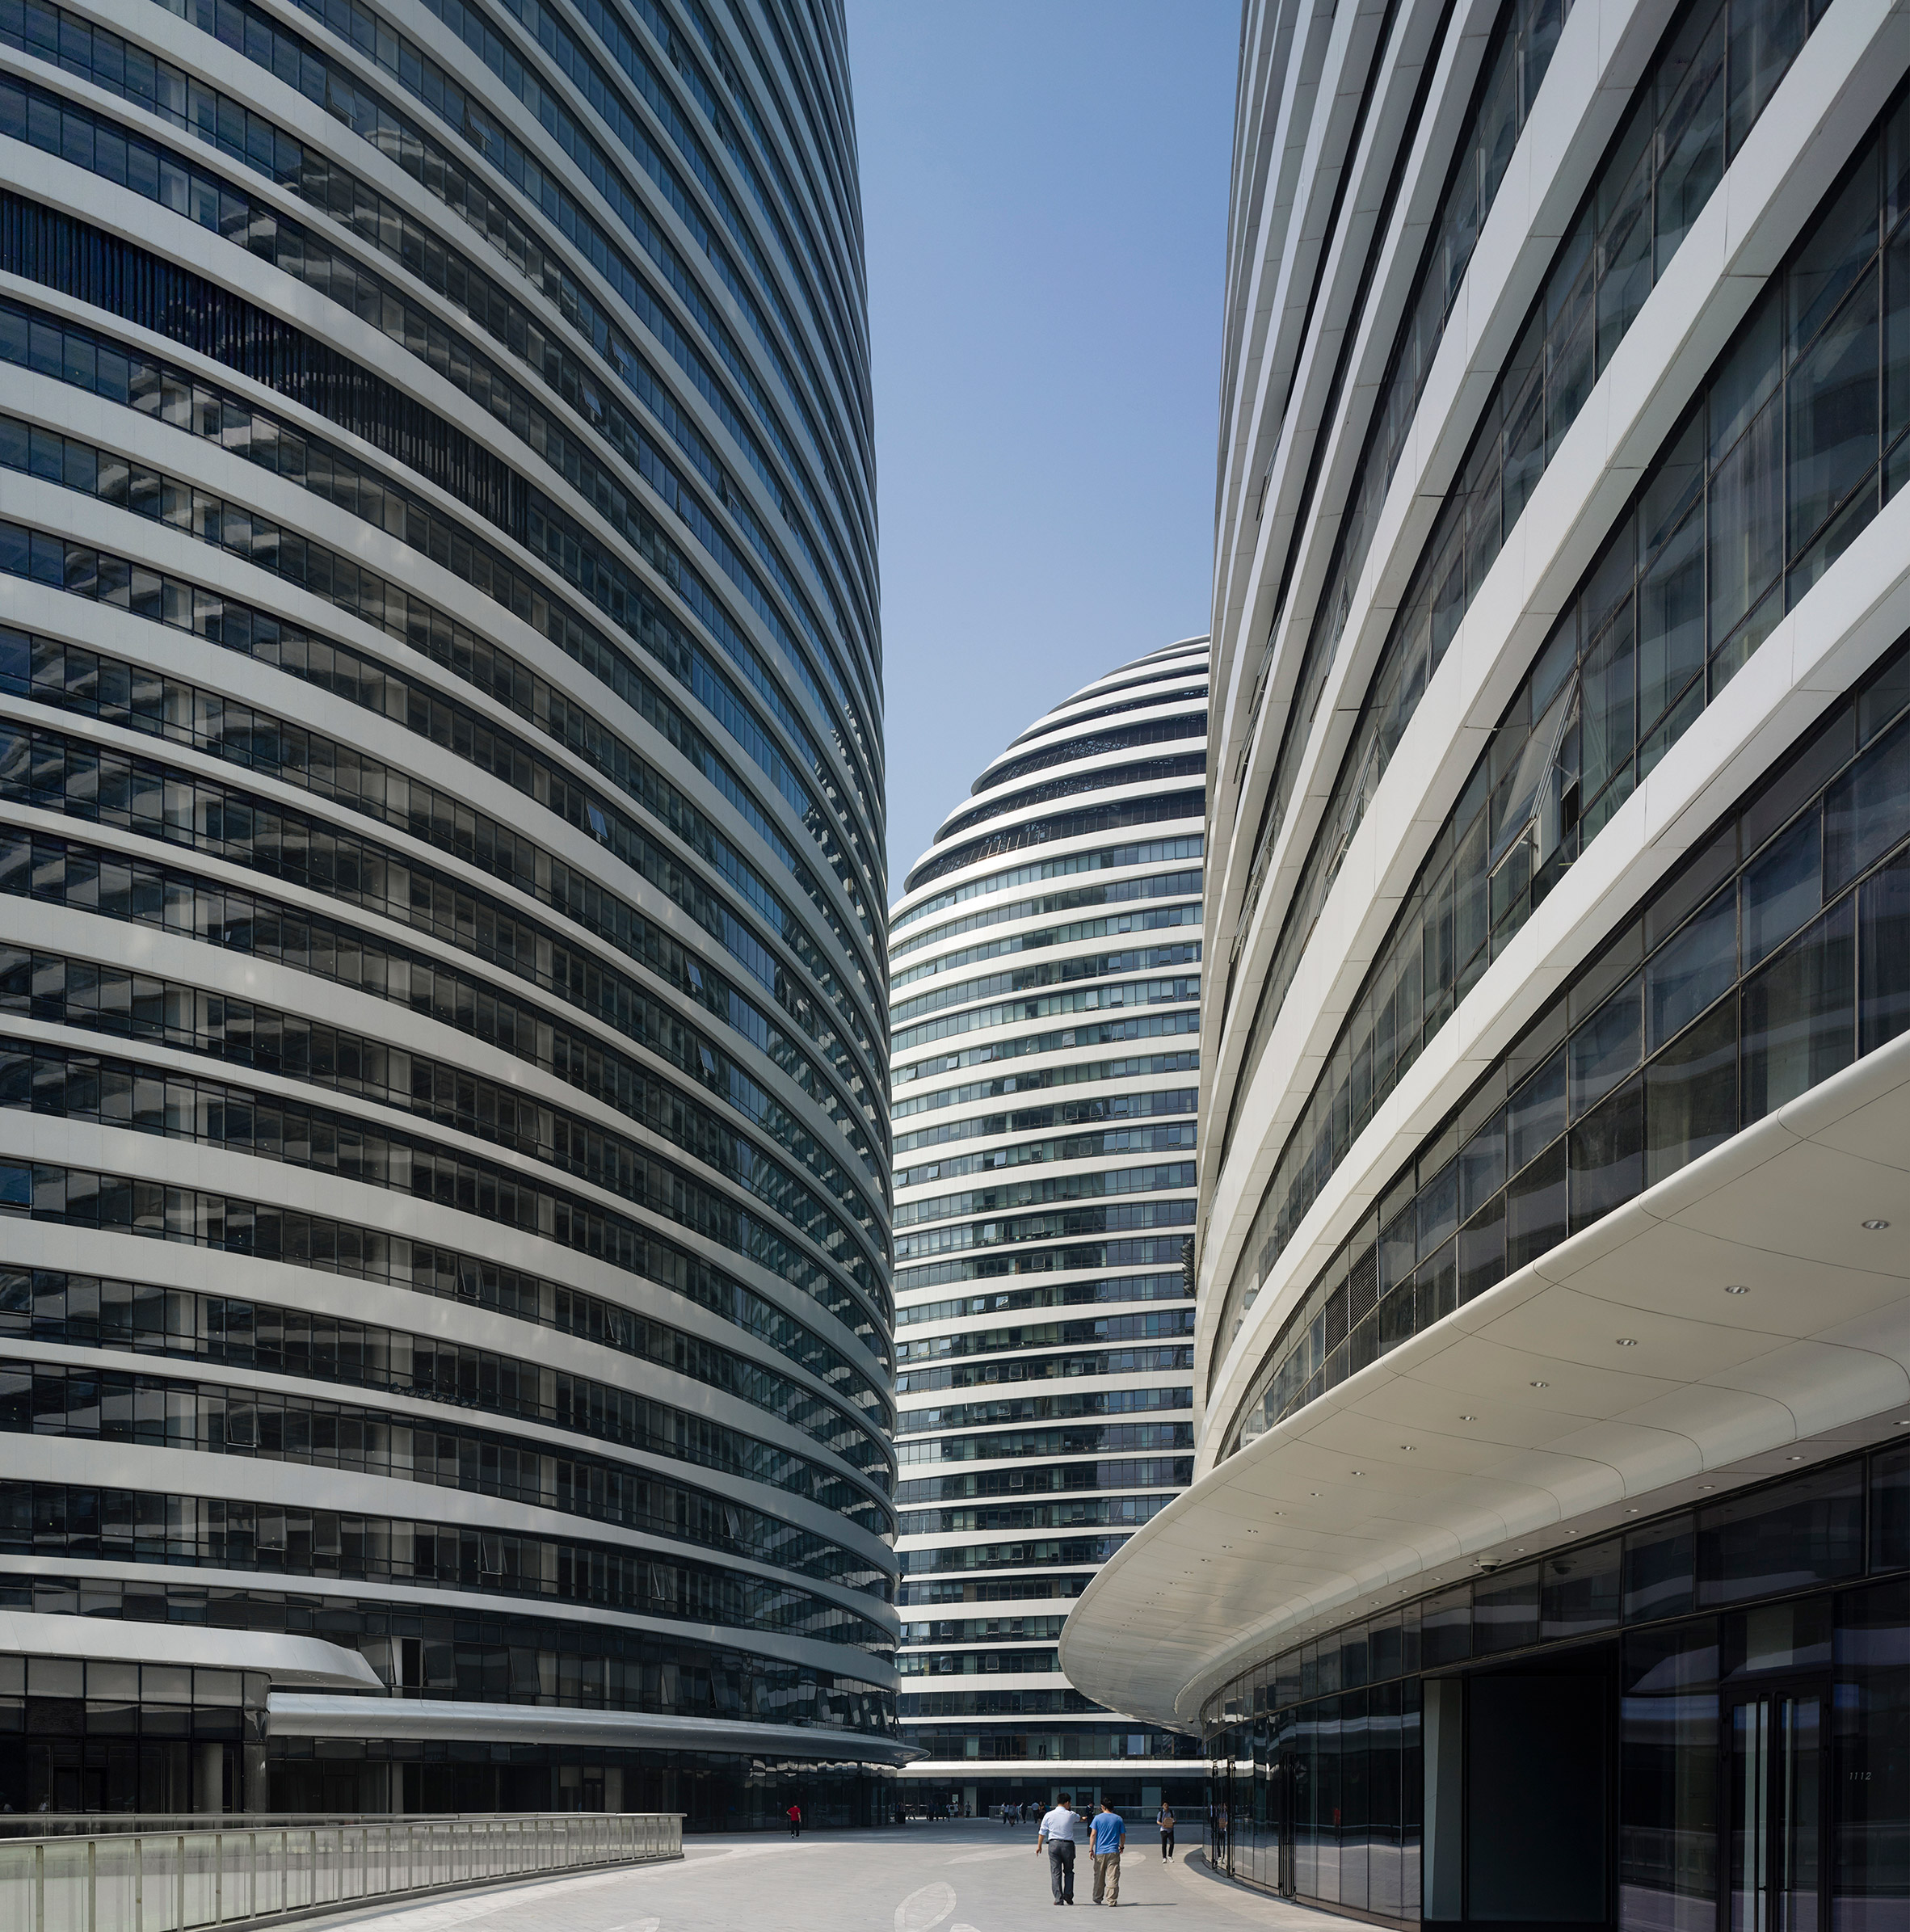 A property developer has won a court case against a website that said the Zaha Hadid Architects design Wangjing Soho had . bad Feng Shui